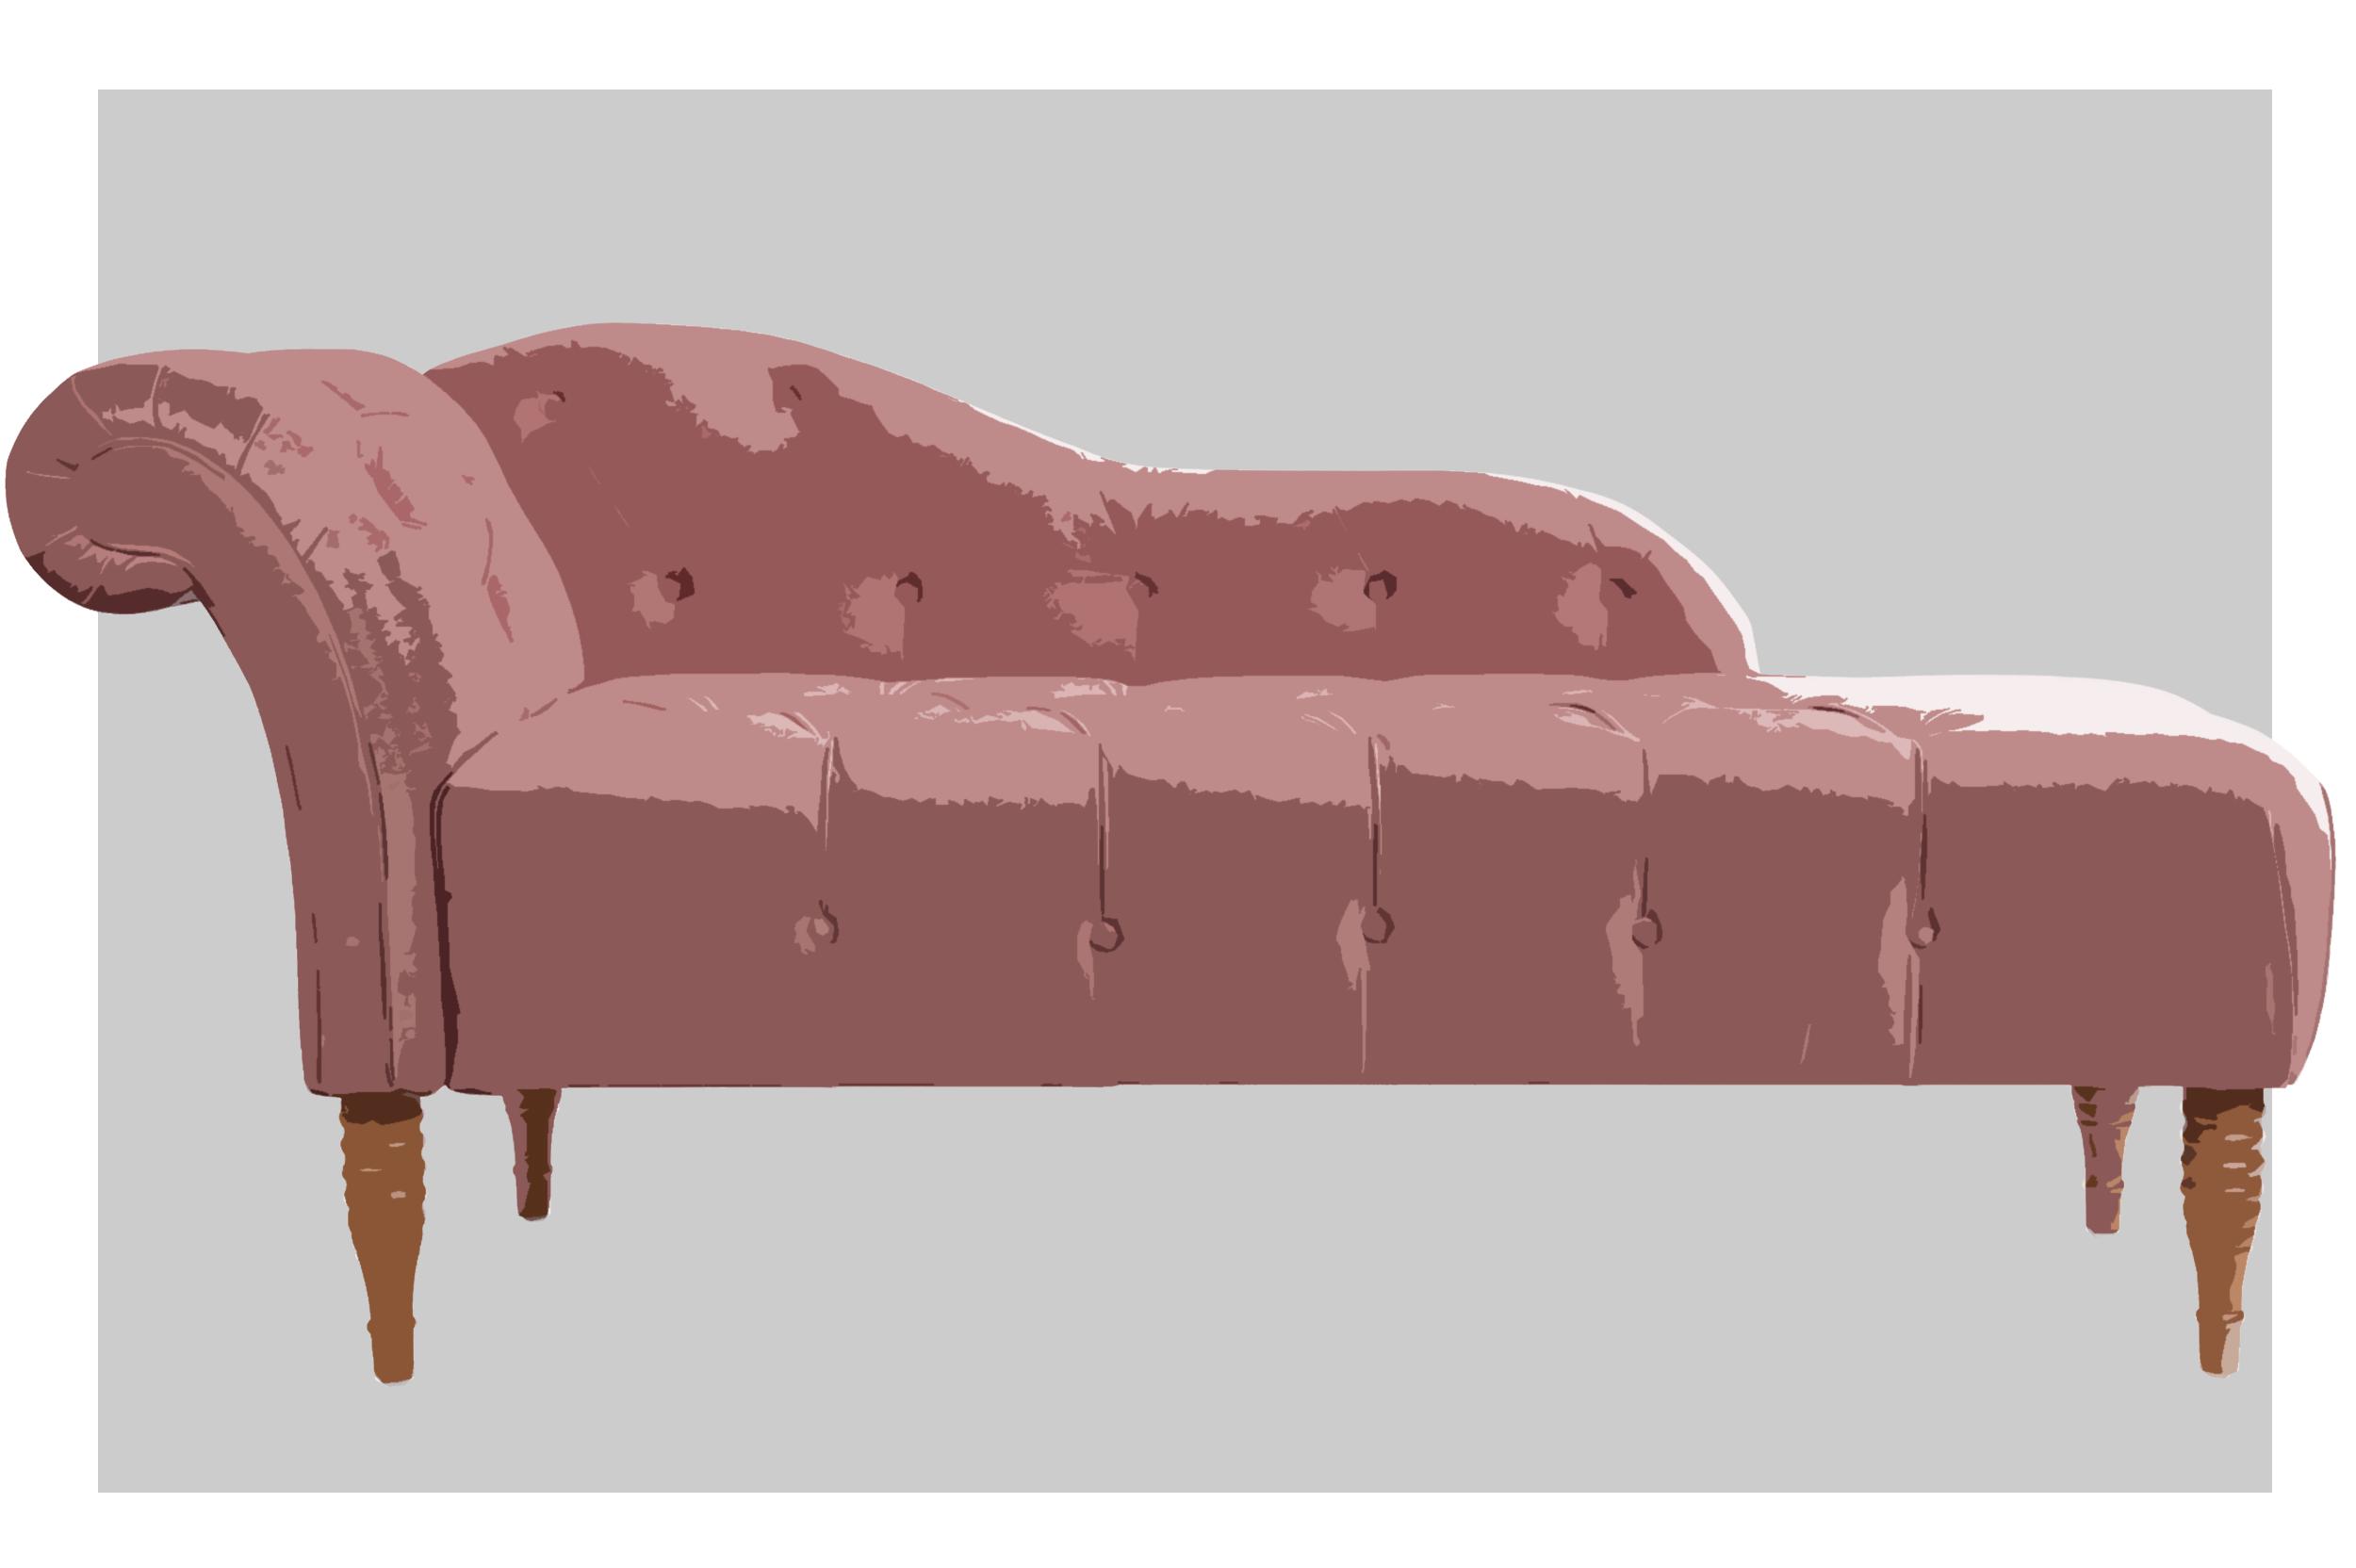 Astonishing Sofa Styles Jennifer Taylor Home Download Free Architecture Designs Intelgarnamadebymaigaardcom